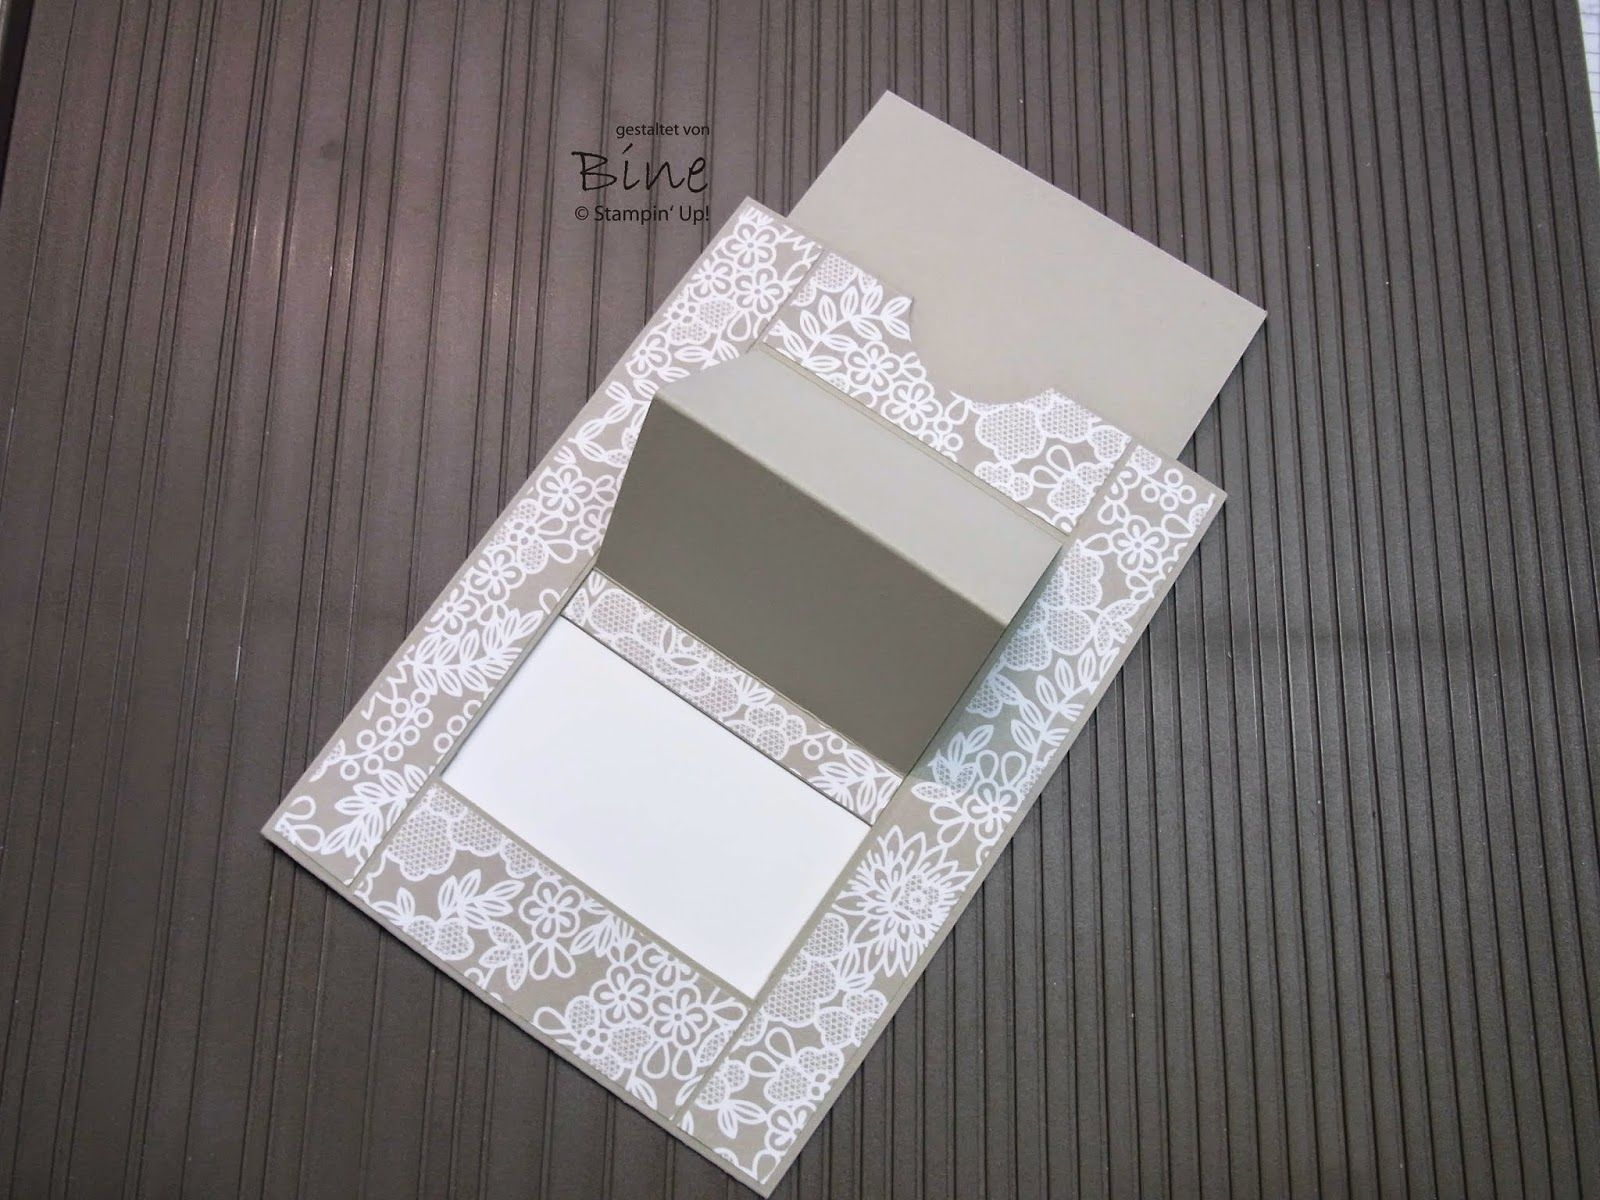 bines karten und mehr anleitung ziehkarte projects. Black Bedroom Furniture Sets. Home Design Ideas